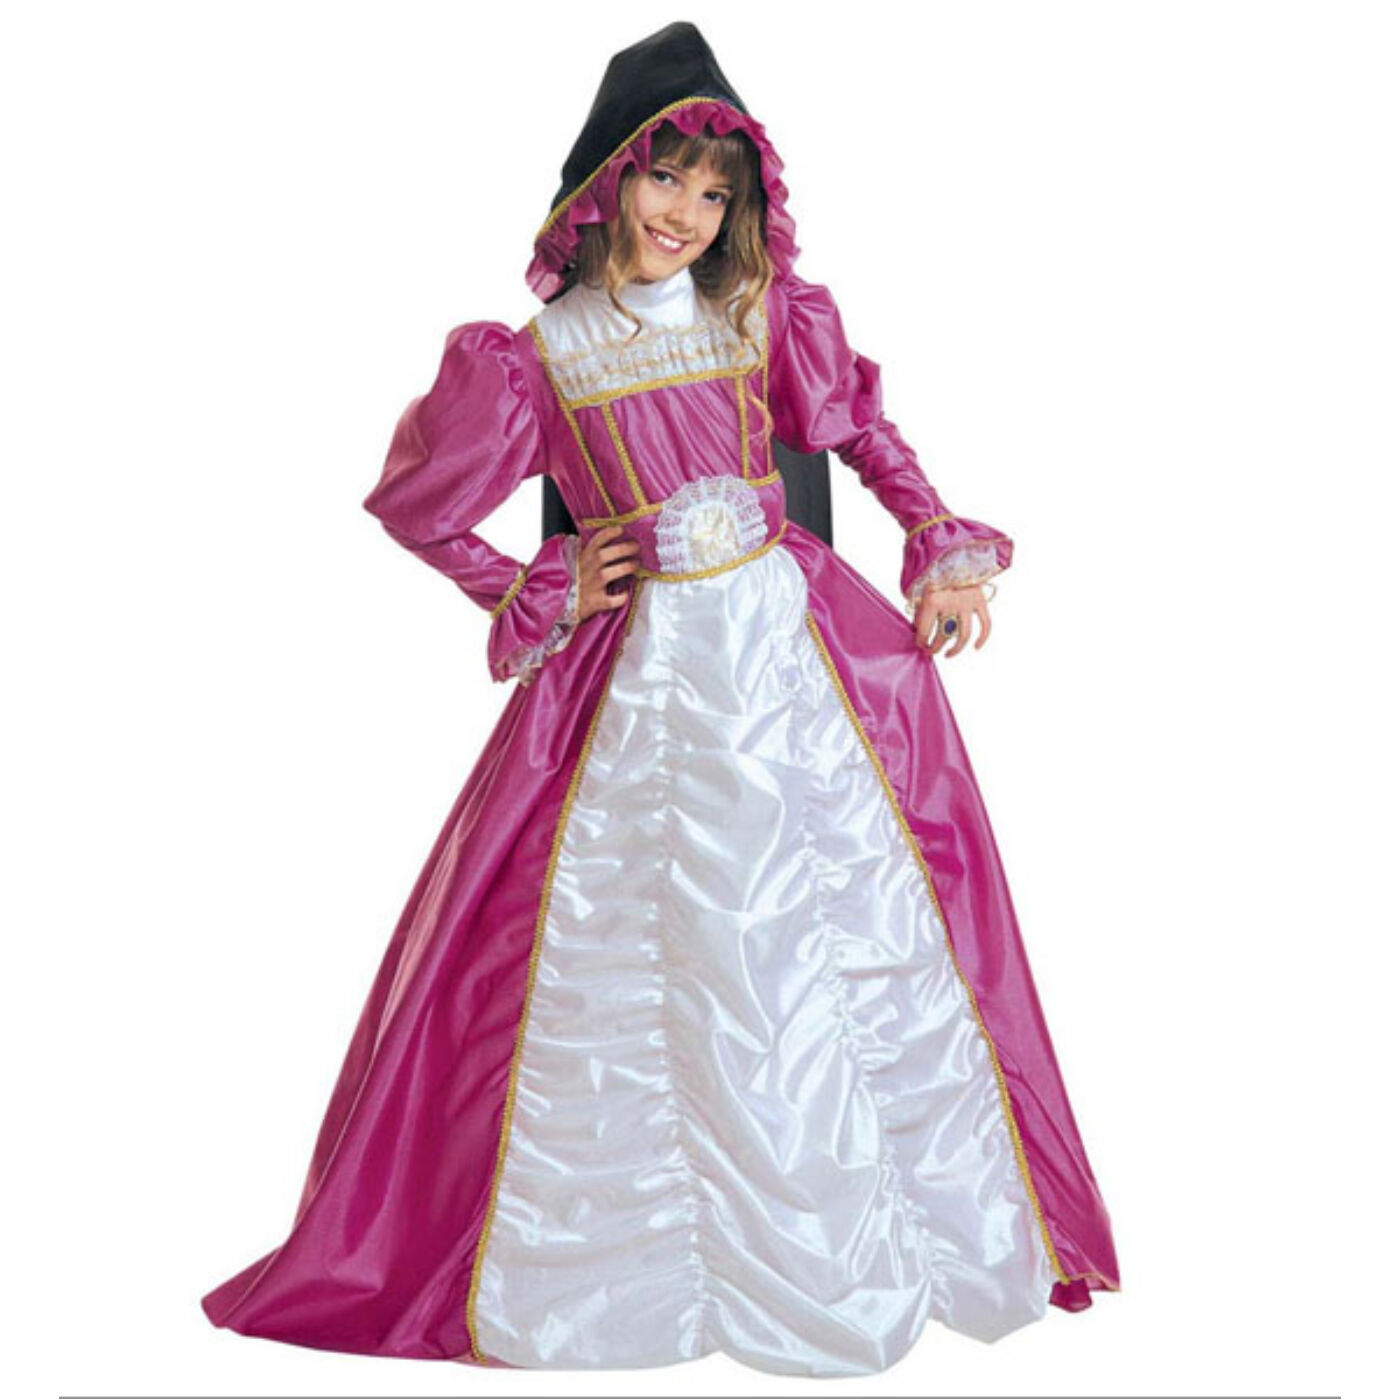 Yorki hercegnő Jelmez 140-es